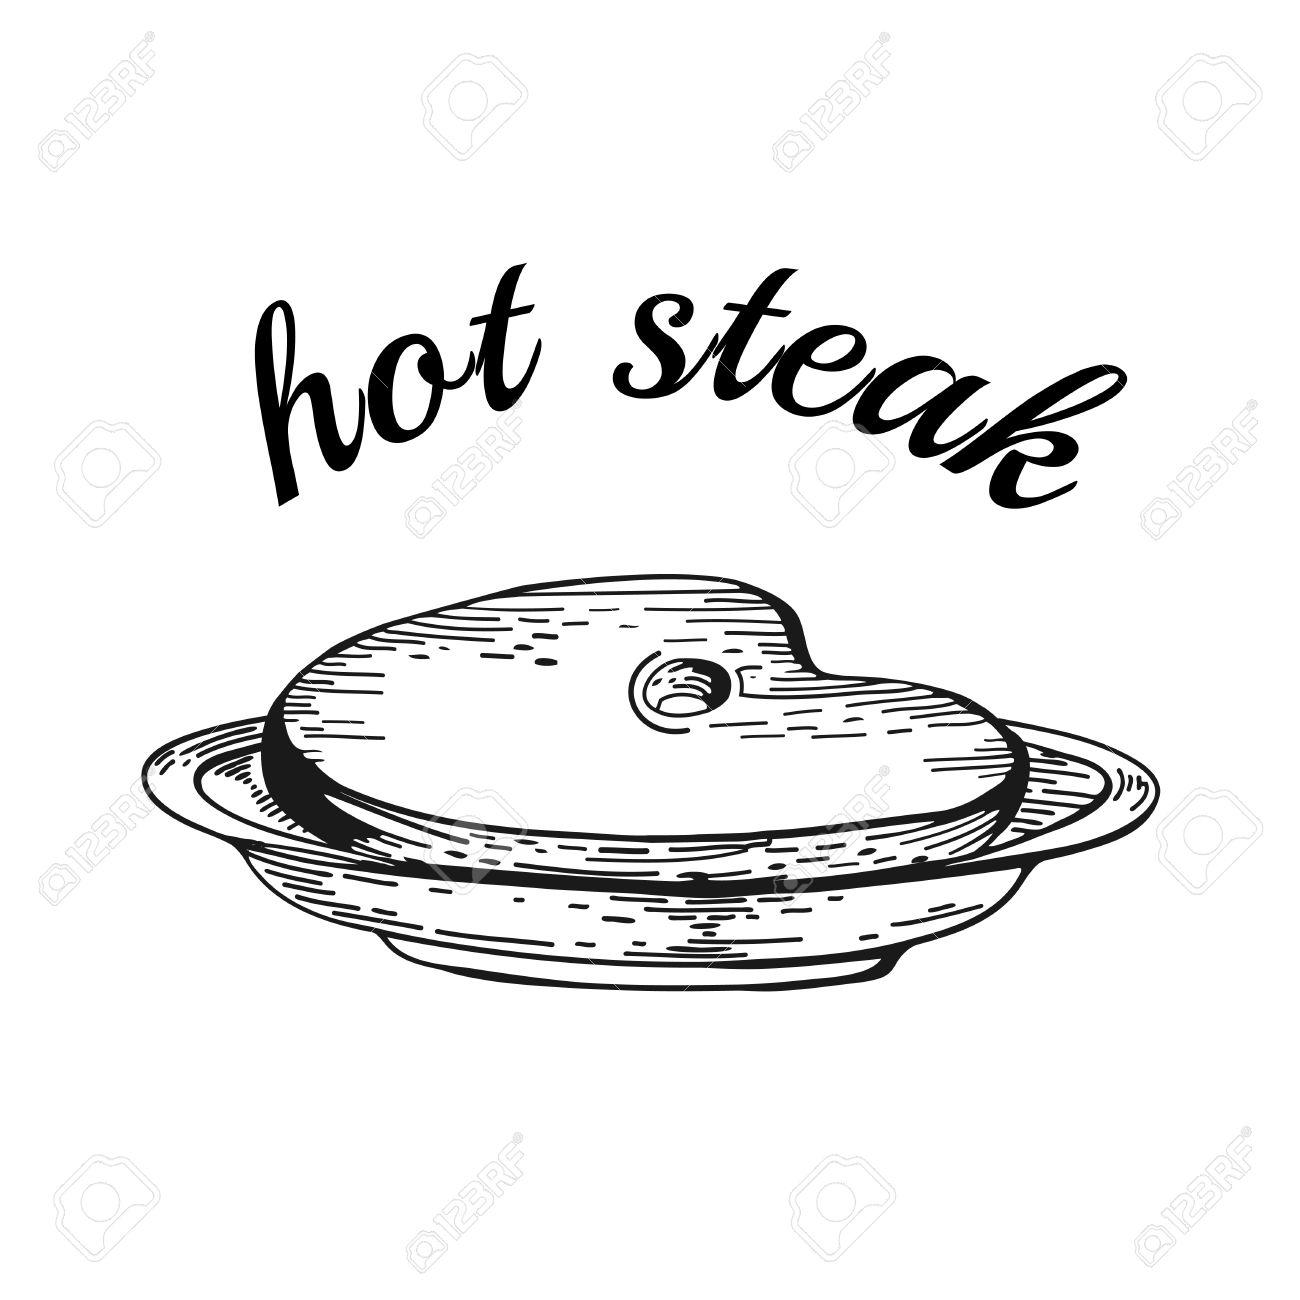 Plate Of Food Drawing At Getdrawings